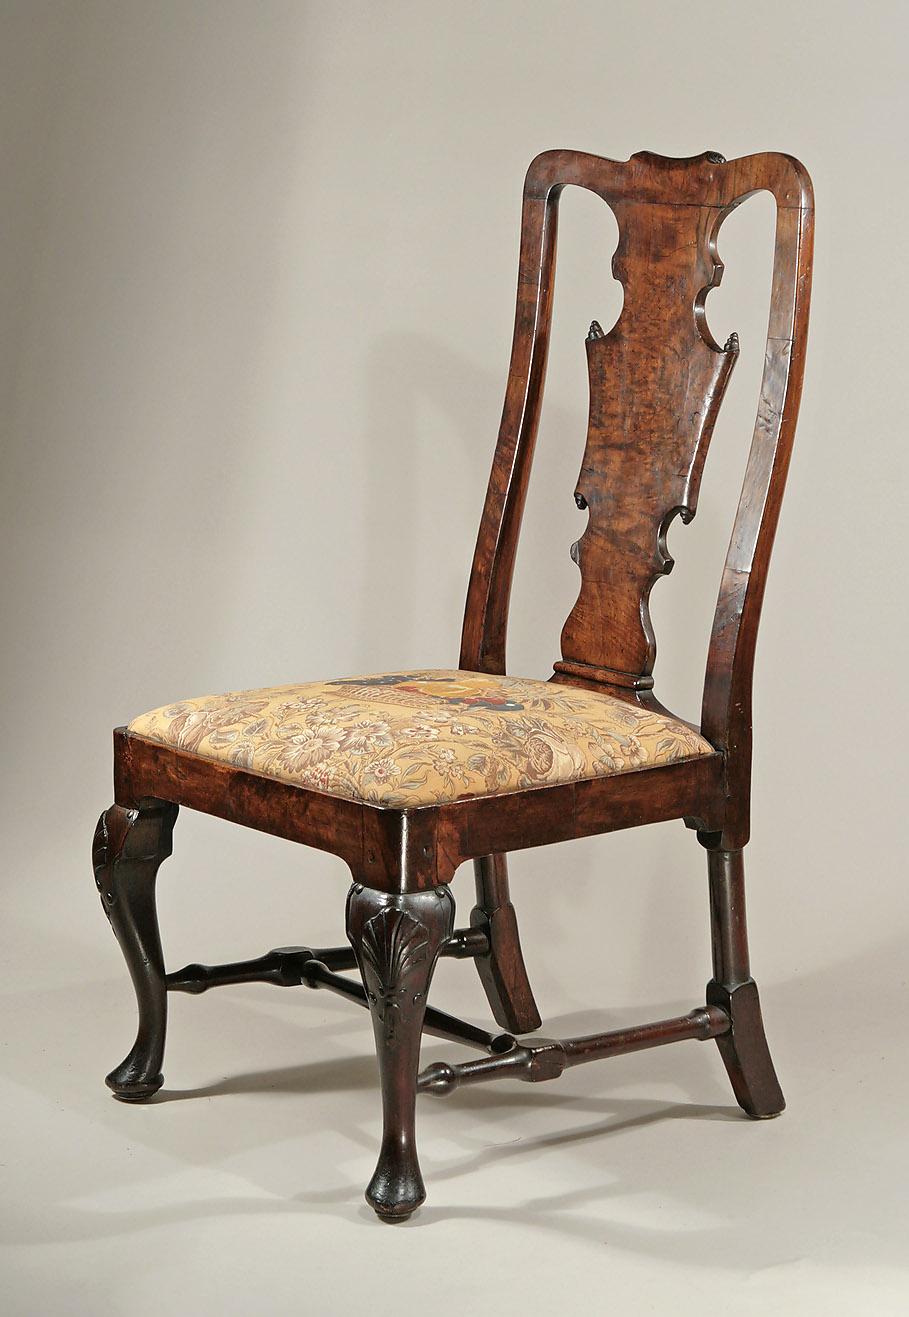 Marvelous Queen Anne / George I Walnut U0026 Burr Walnut Sidechair Of Generous  Proportions, C1715; M. Ford Creech Antiques U0026 Fine Arts, Memphis, TN